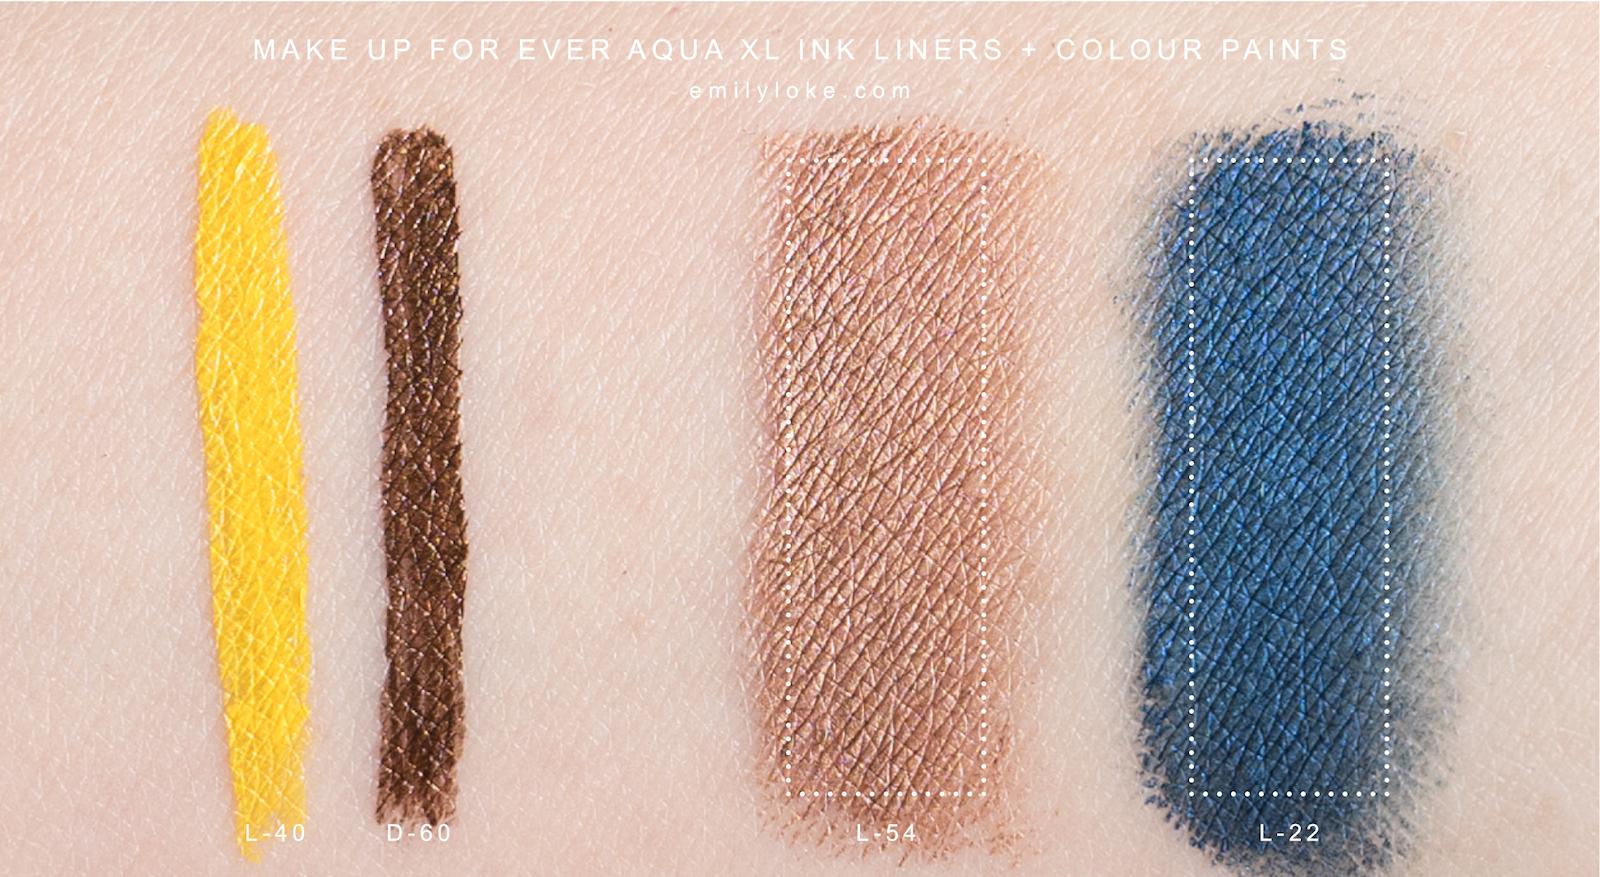 make up for ever aqua xl colour paints and ink liners. Black Bedroom Furniture Sets. Home Design Ideas